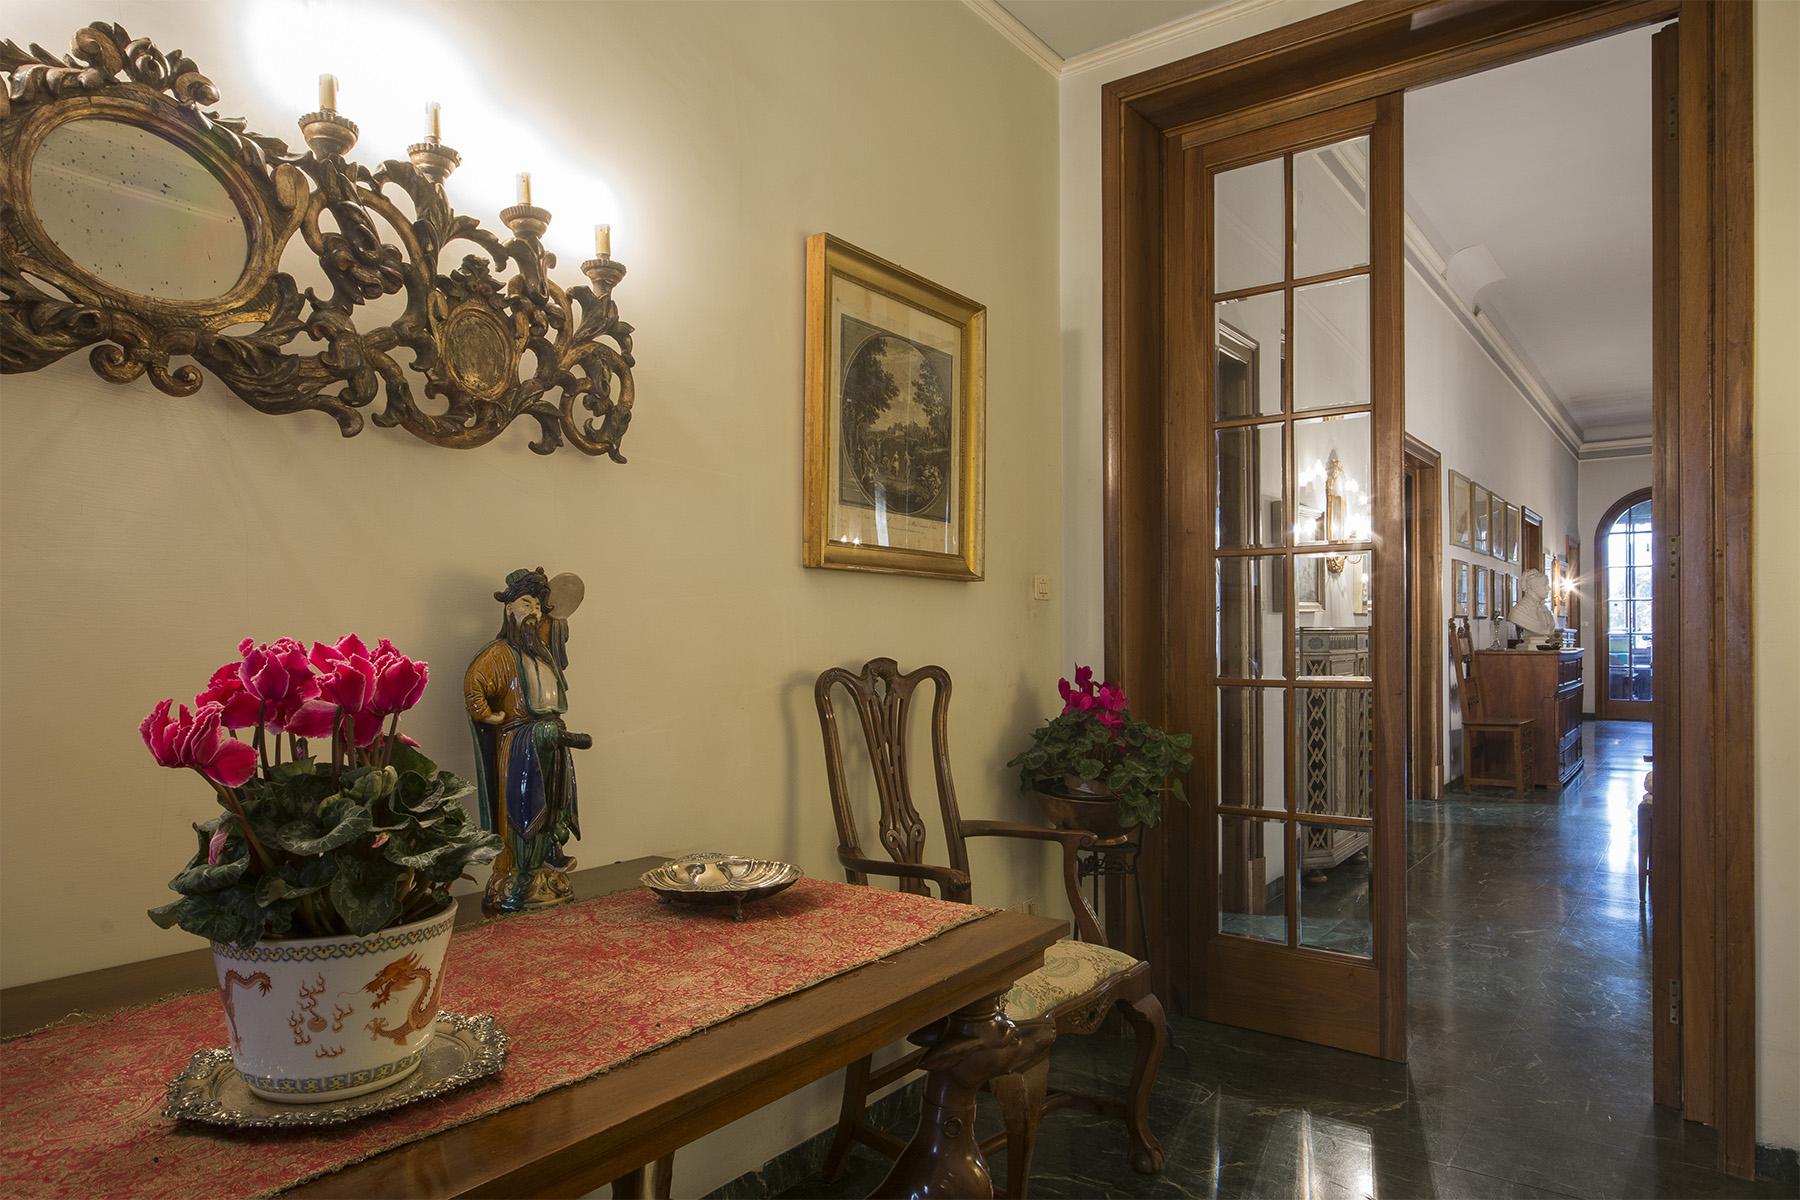 Attico in Vendita a Firenze: 5 locali, 400 mq - Foto 4